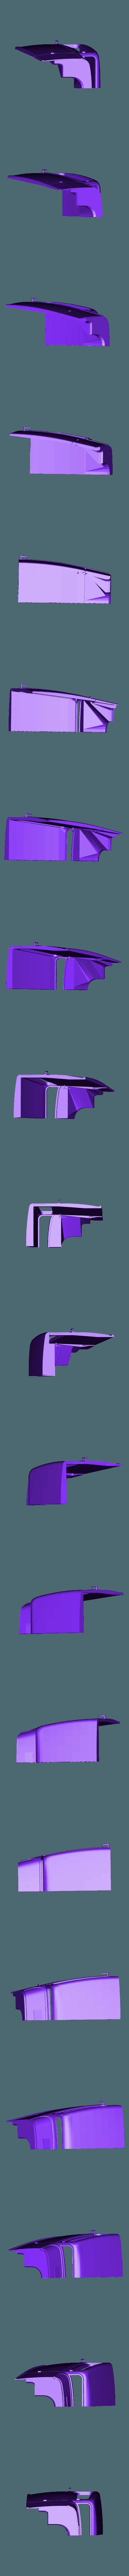 hotrod flanc 2.stl Download STL file Fury road hotrod bodyshell 1/10 • 3D printing design, RCGANG93